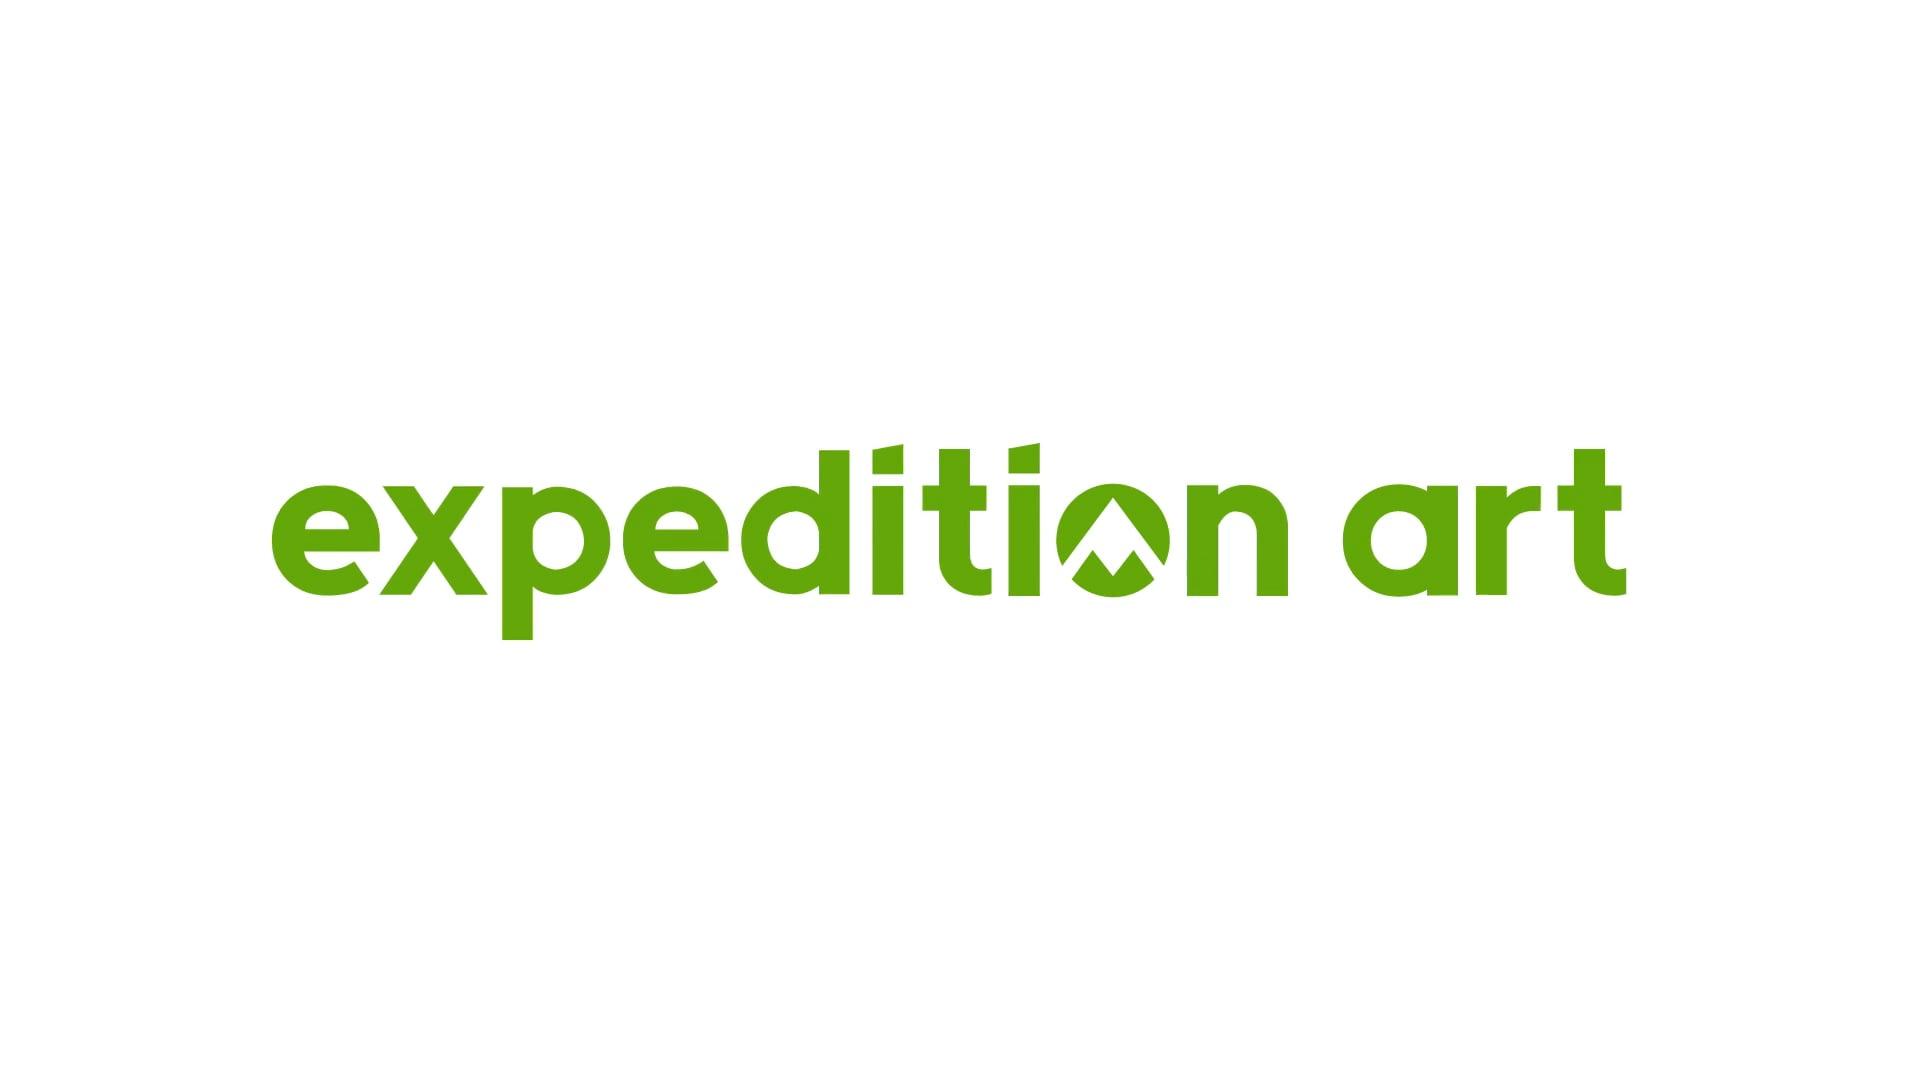 Expedition Art - Preparing for Fundraising